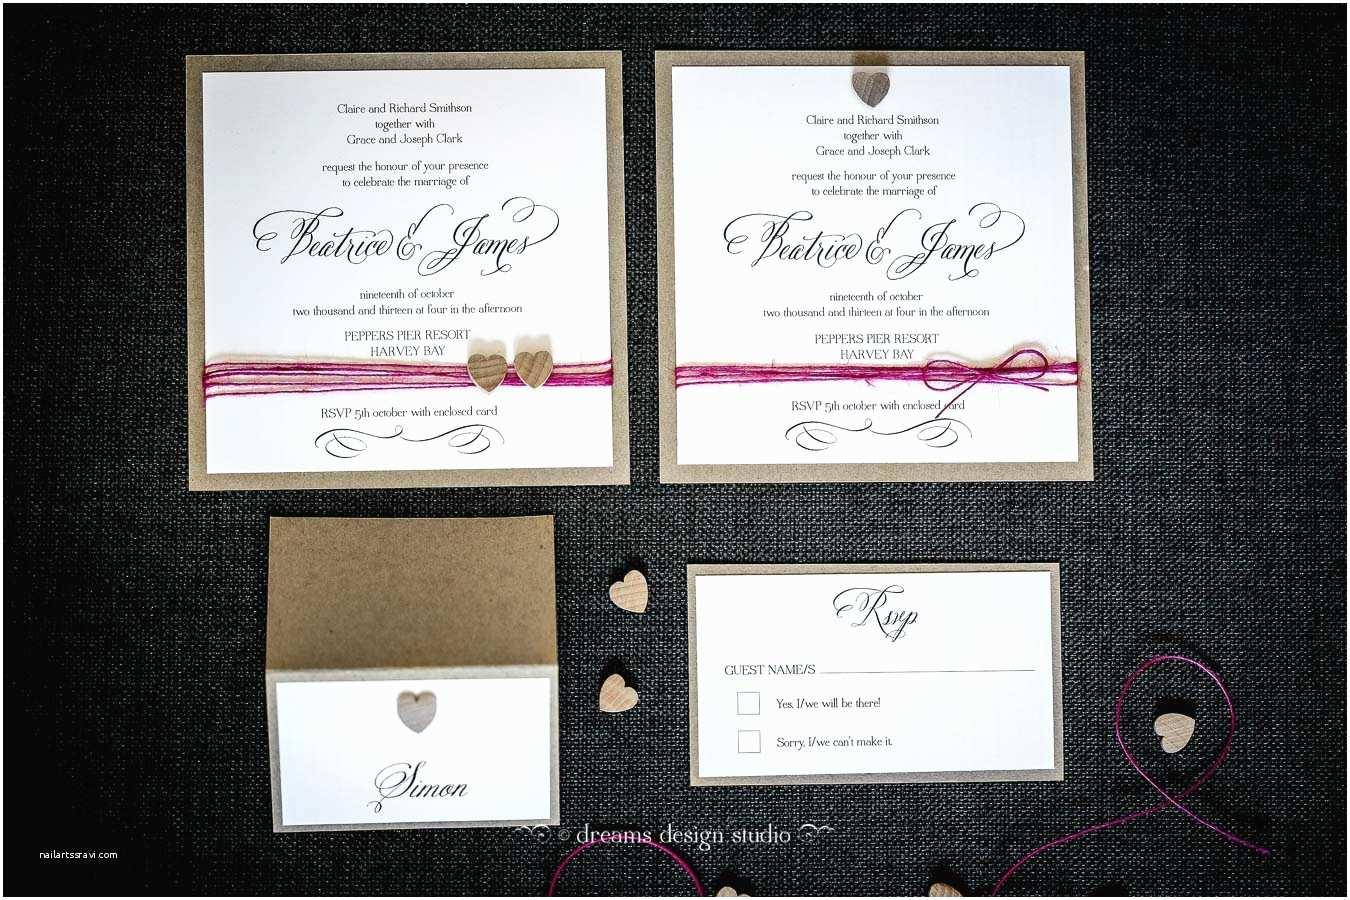 Wedding Invitation Checklist the Wedding Invitation Checklist Dreams Design Studio